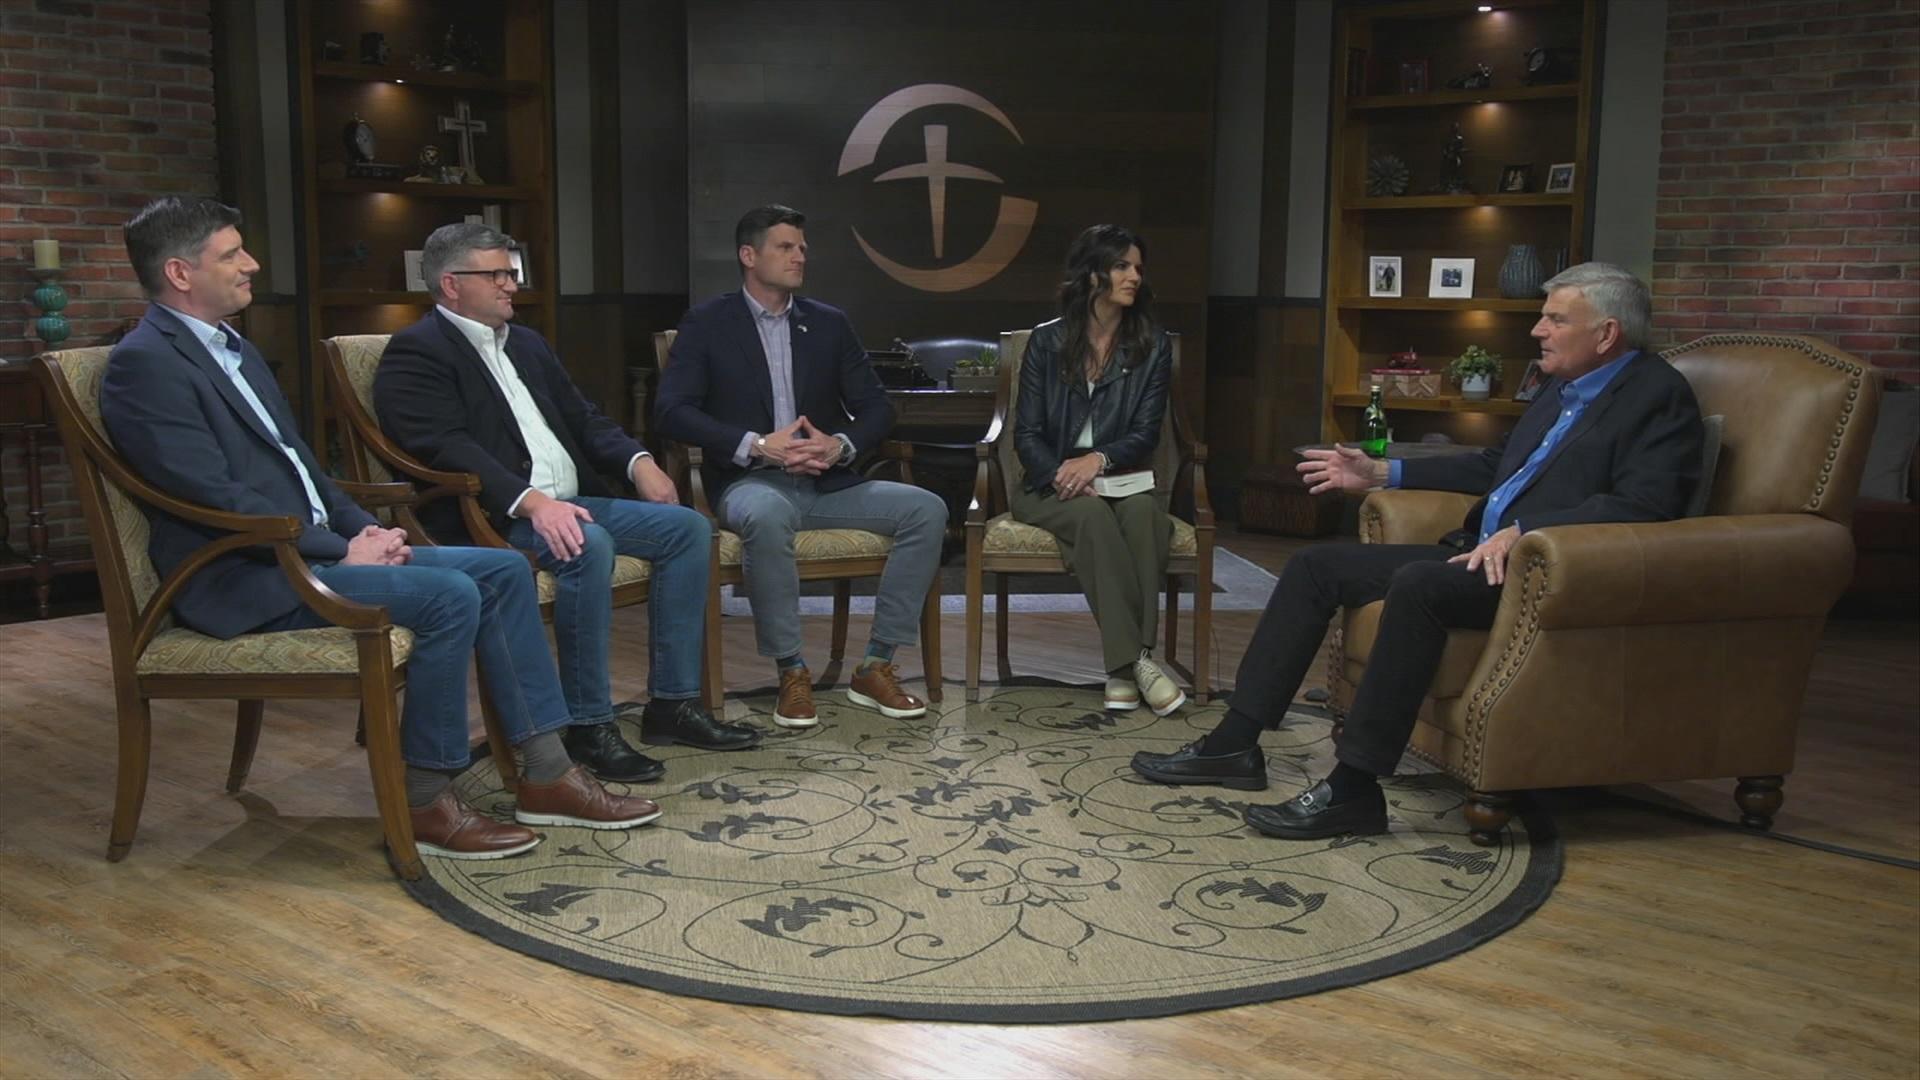 Praise | Franklin Graham & Family | May 4, 2020